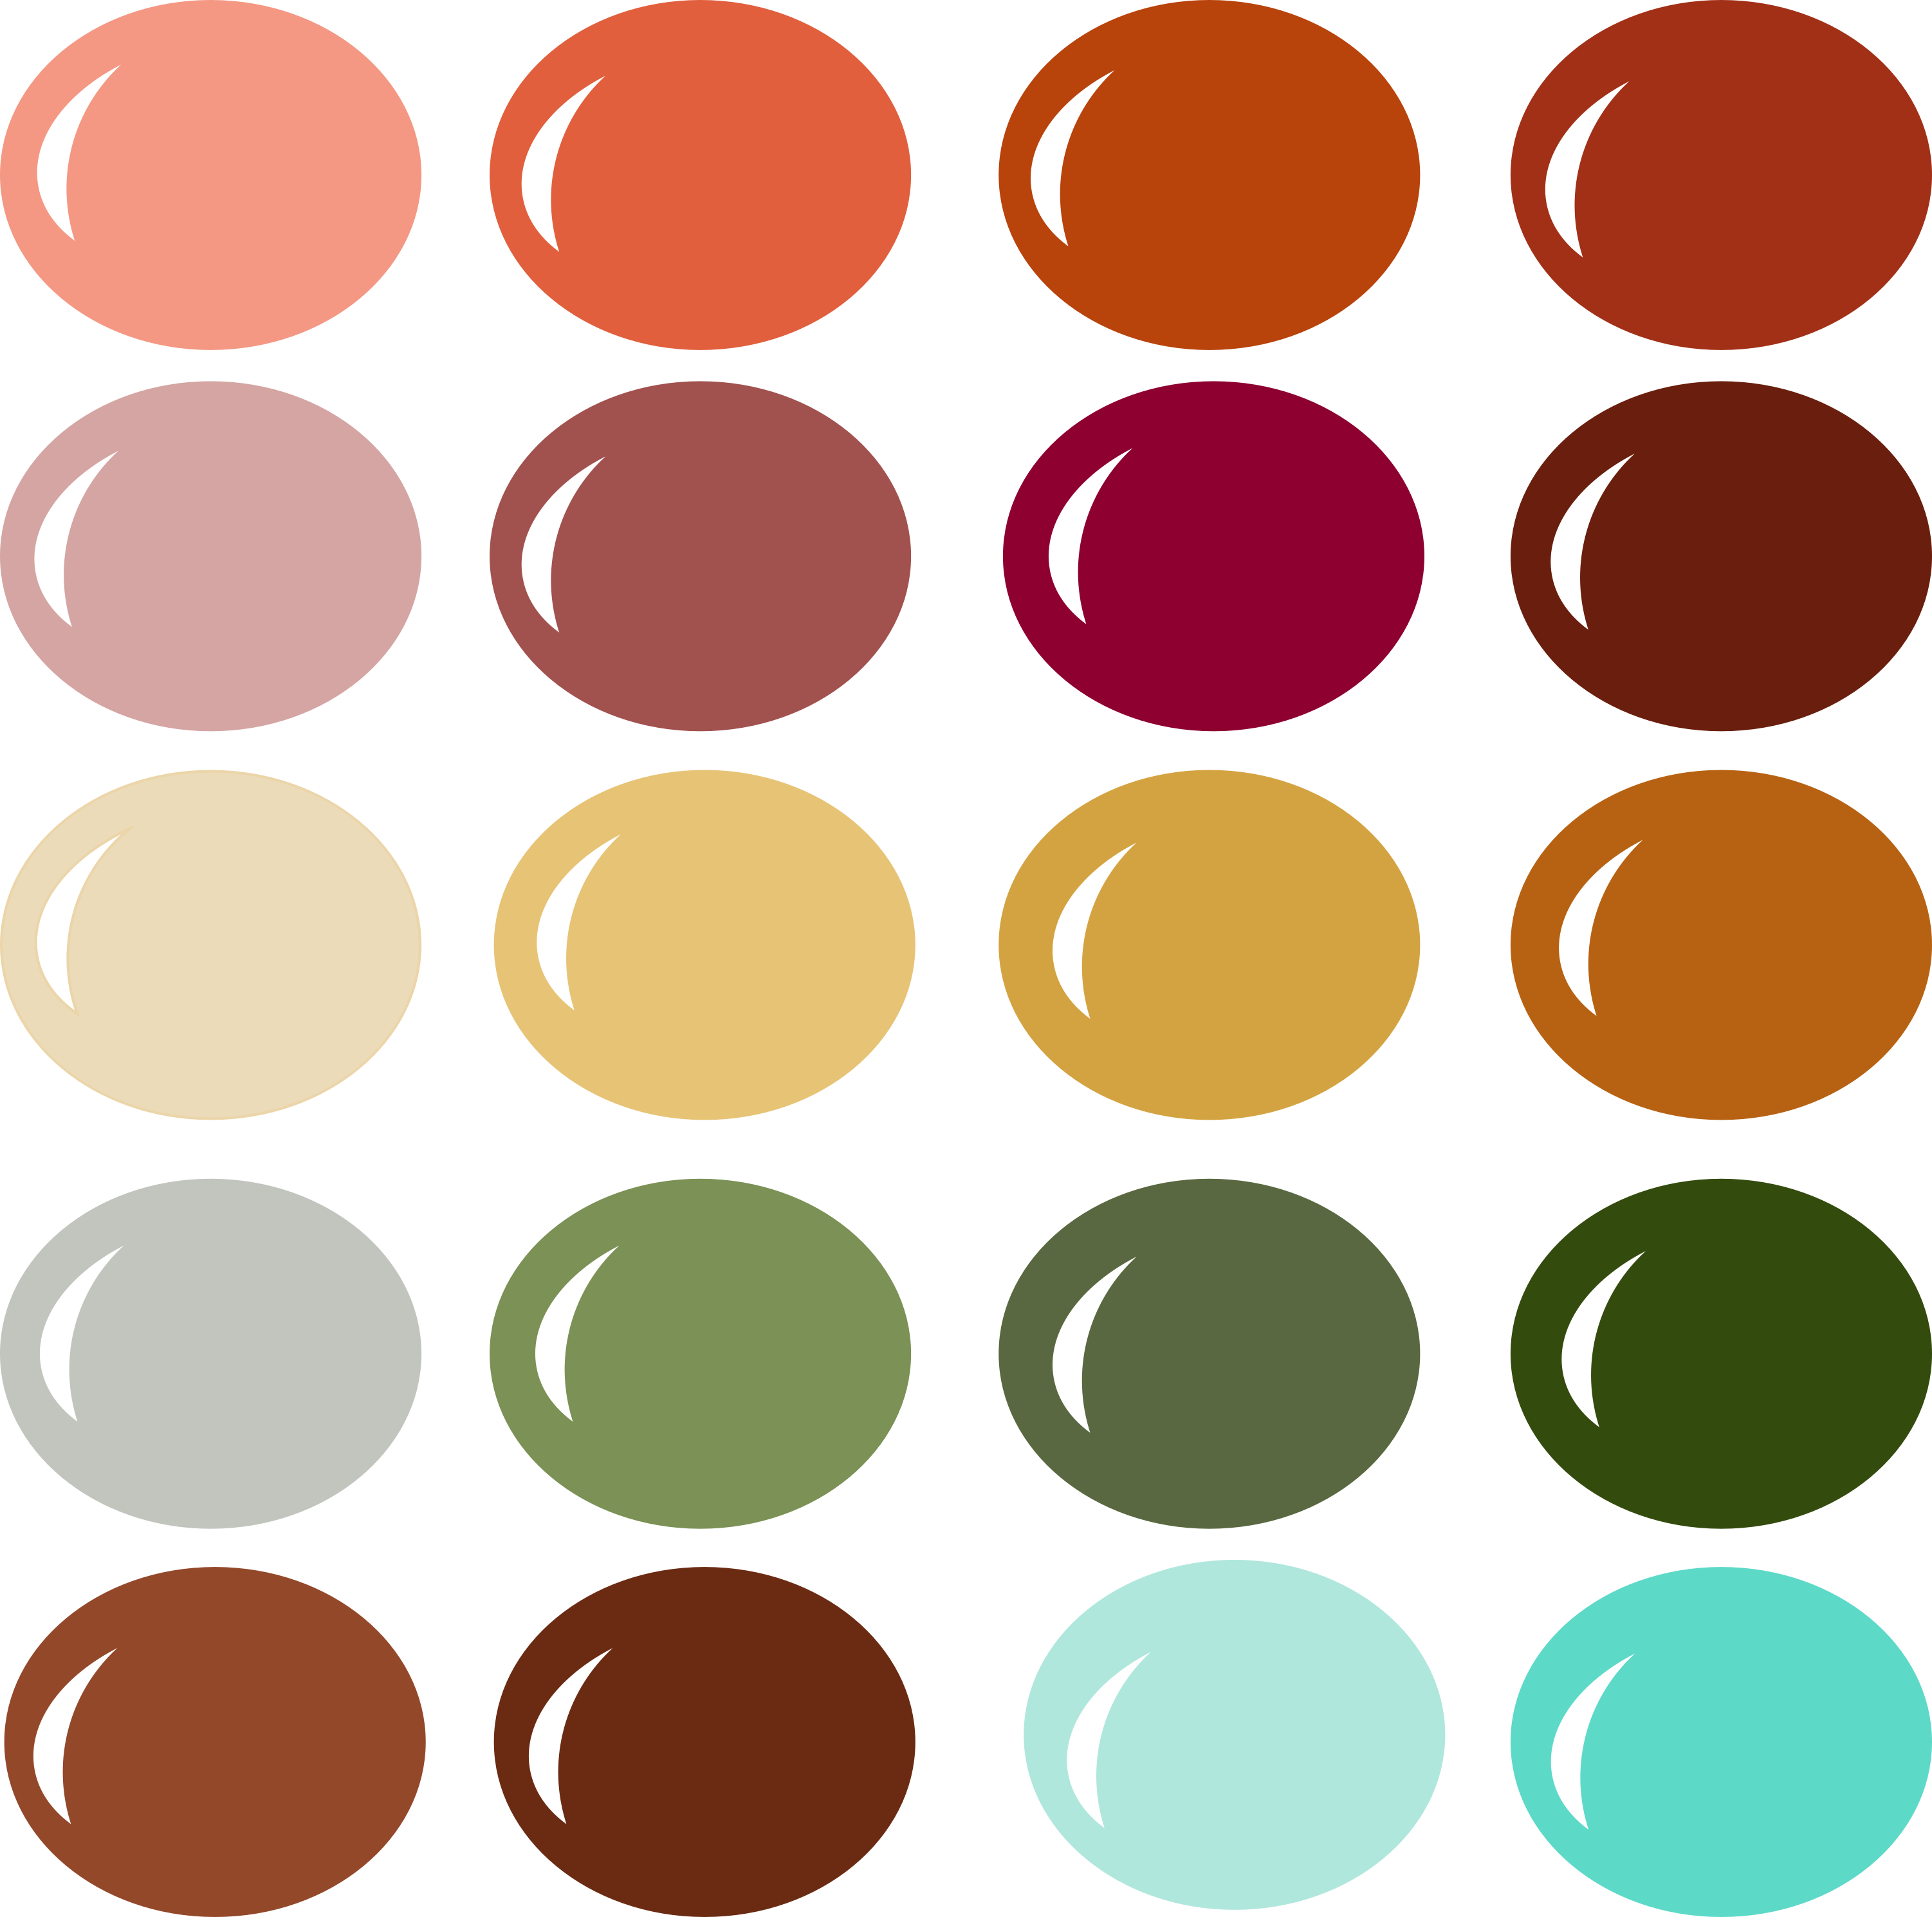 InVue Color Palette: Falling Leaves